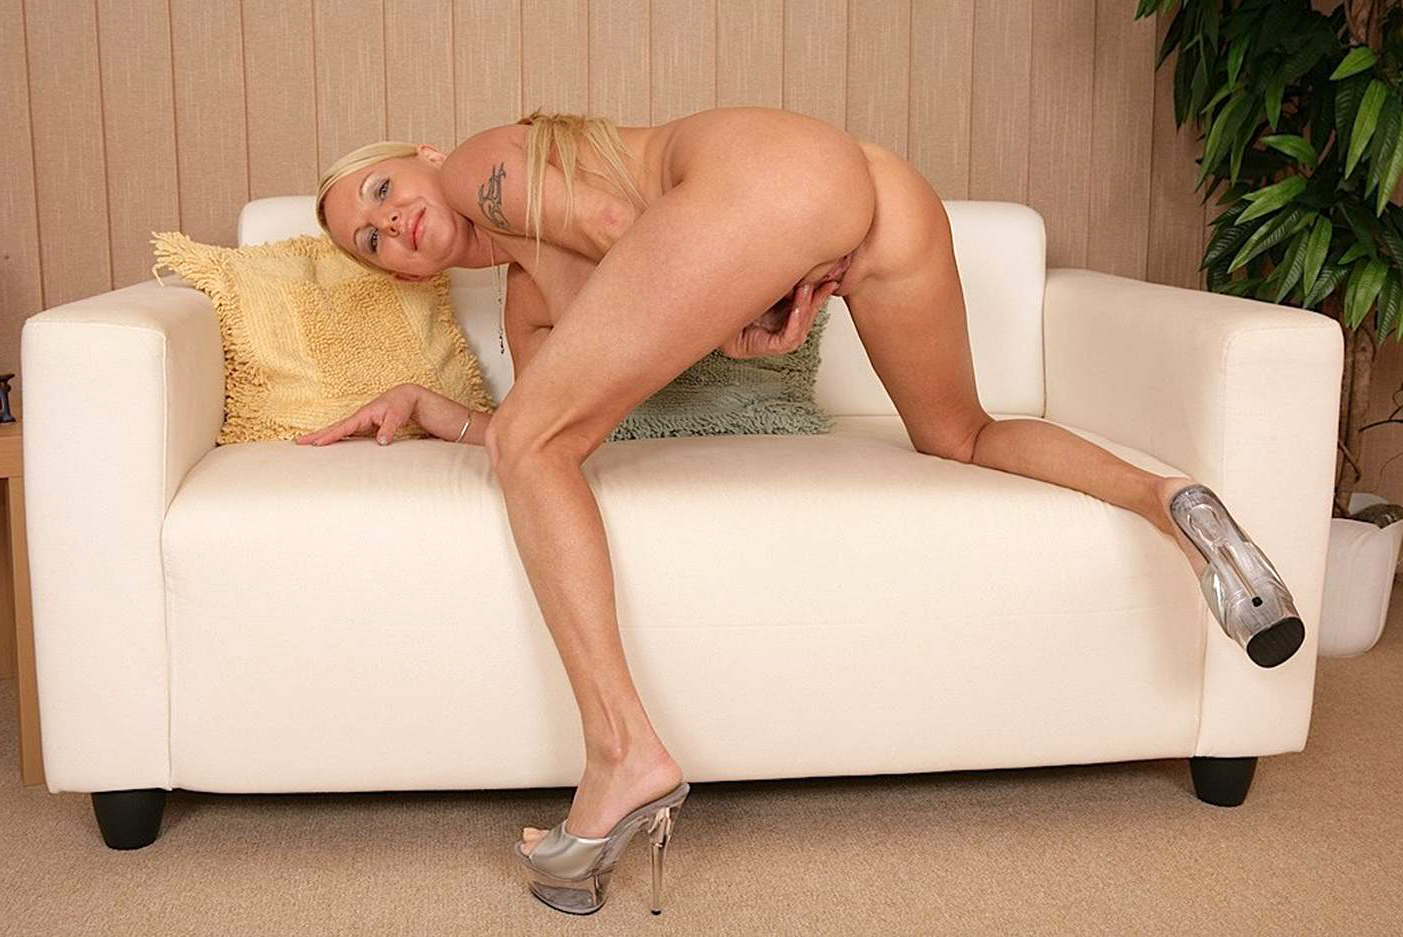 Nude gaunt Caroline Aherne